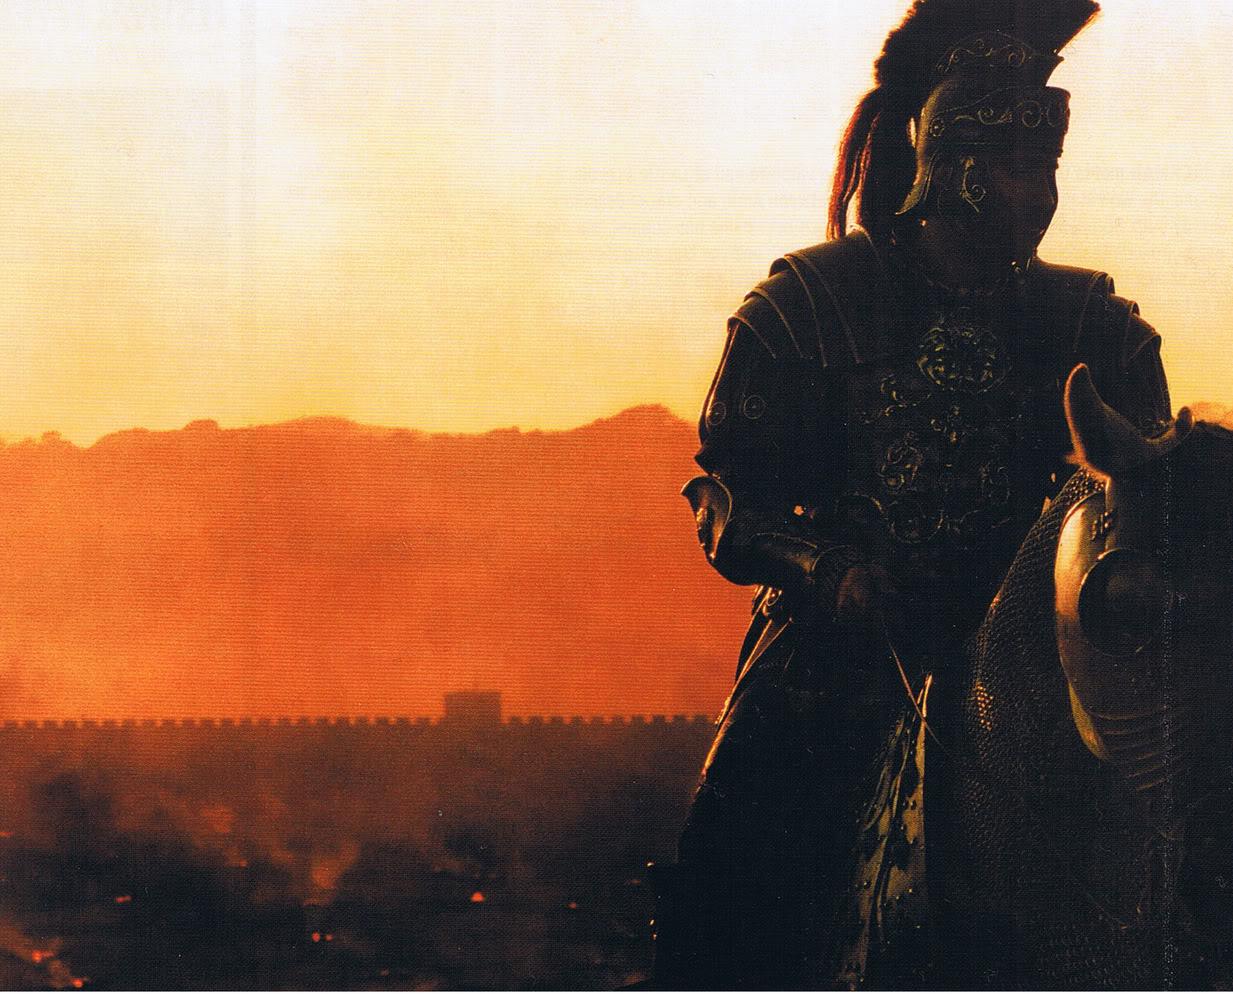 http://2.bp.blogspot.com/-CmW8F2RpJr0/T0vbkY7-eNI/AAAAAAAAAEo/SYGMLfADlG8/s1600/king+arthur+movie.jpg